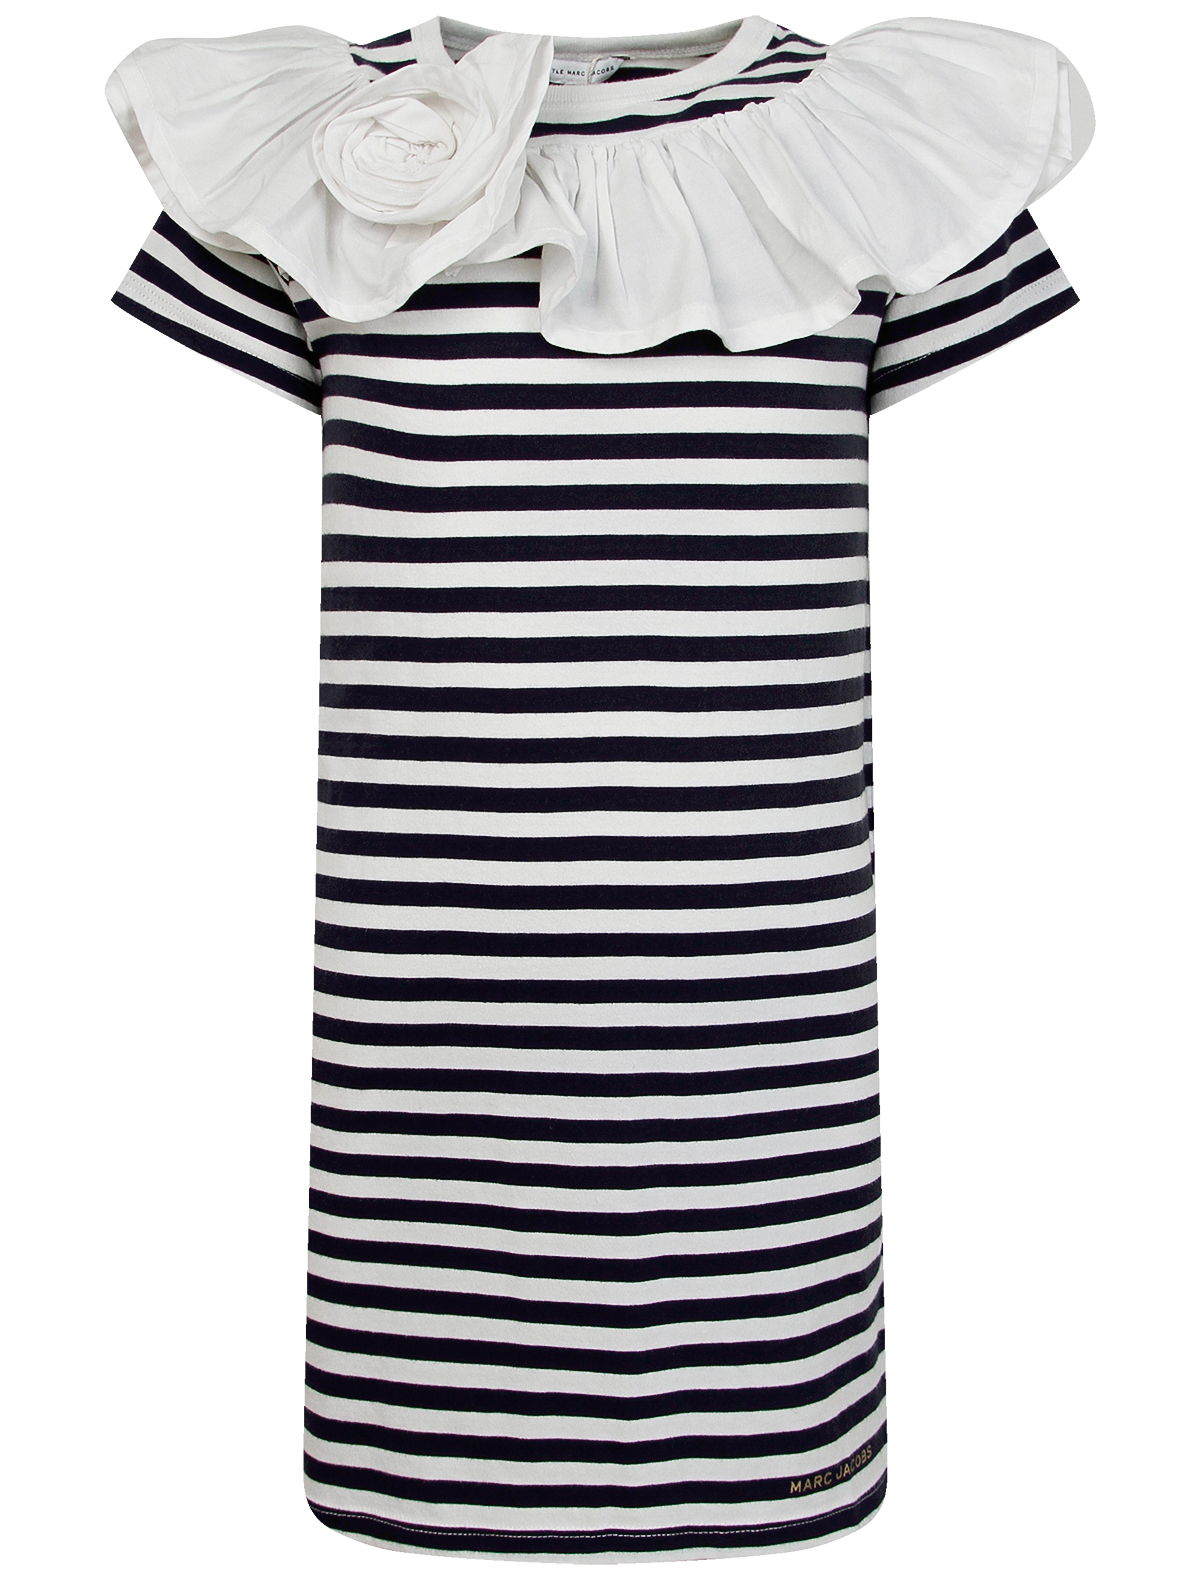 Платье LITTLE MARC JACOBS цв. белый/синий, р. 92